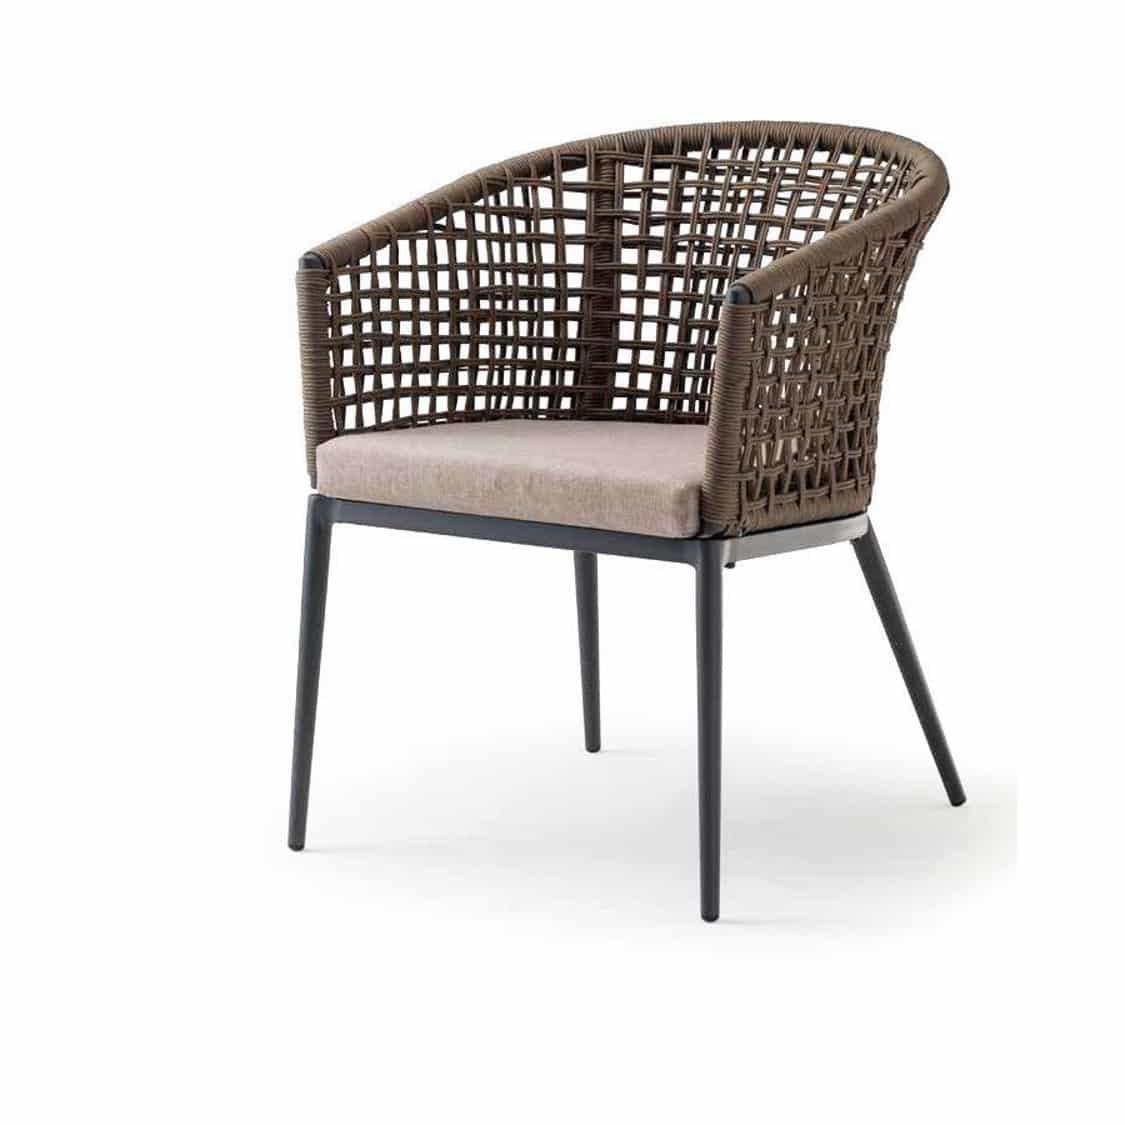 Cuba Armchair Outside Restaurant Bar Coffee Shop Cafe DeFrae Contract Furniture